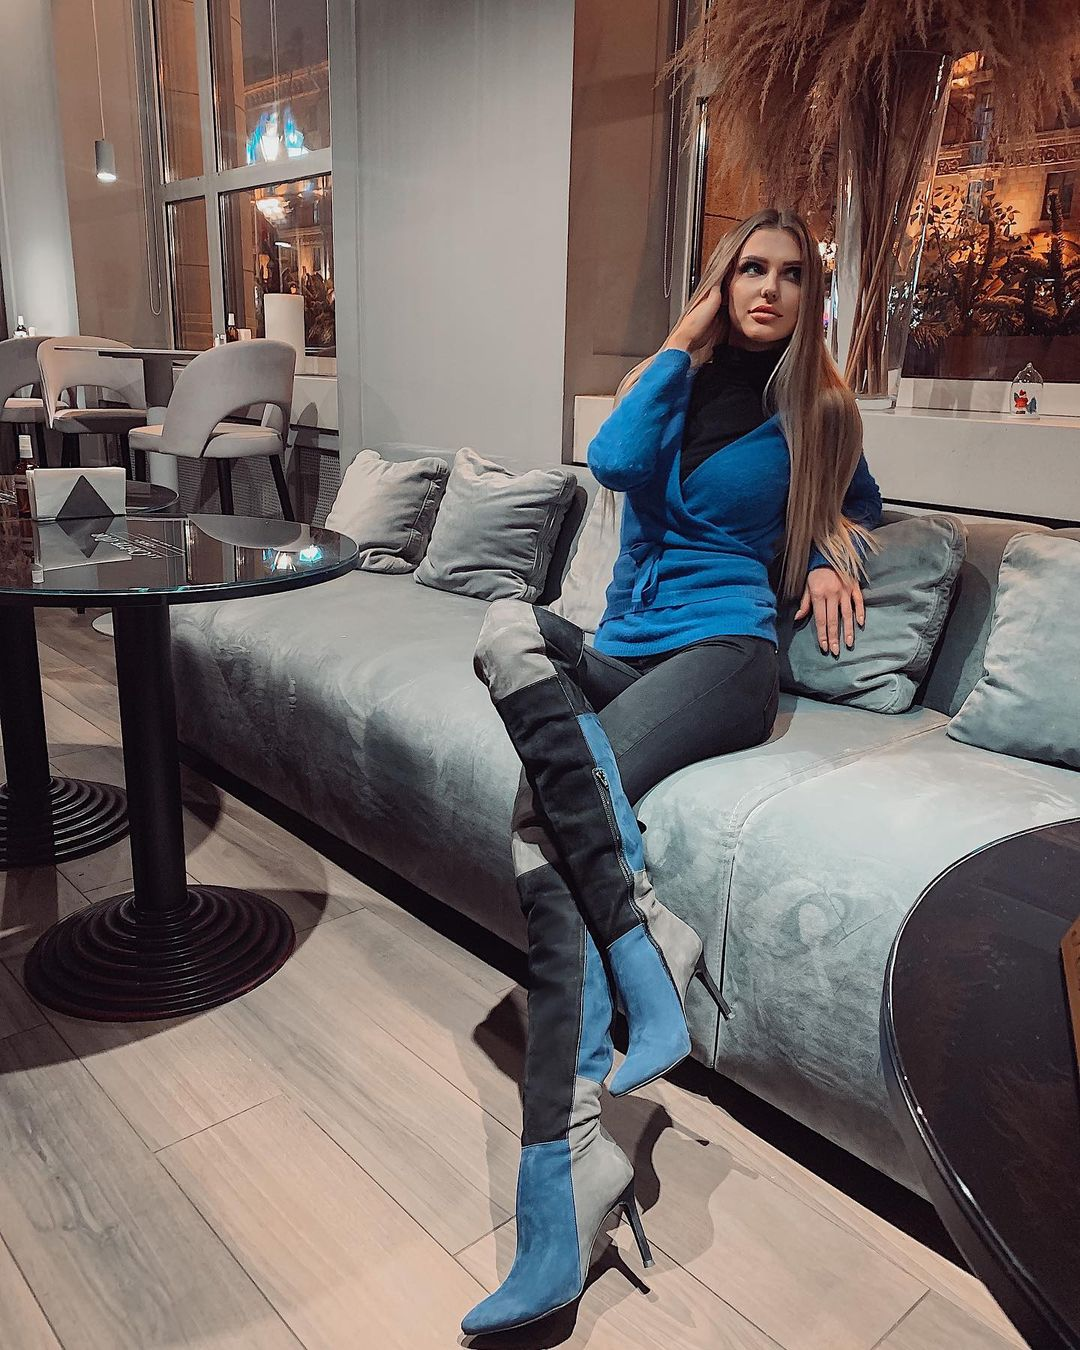 Yuliana-Sholomitskaya-Wallpapers-Insta-Fit-Bio-9